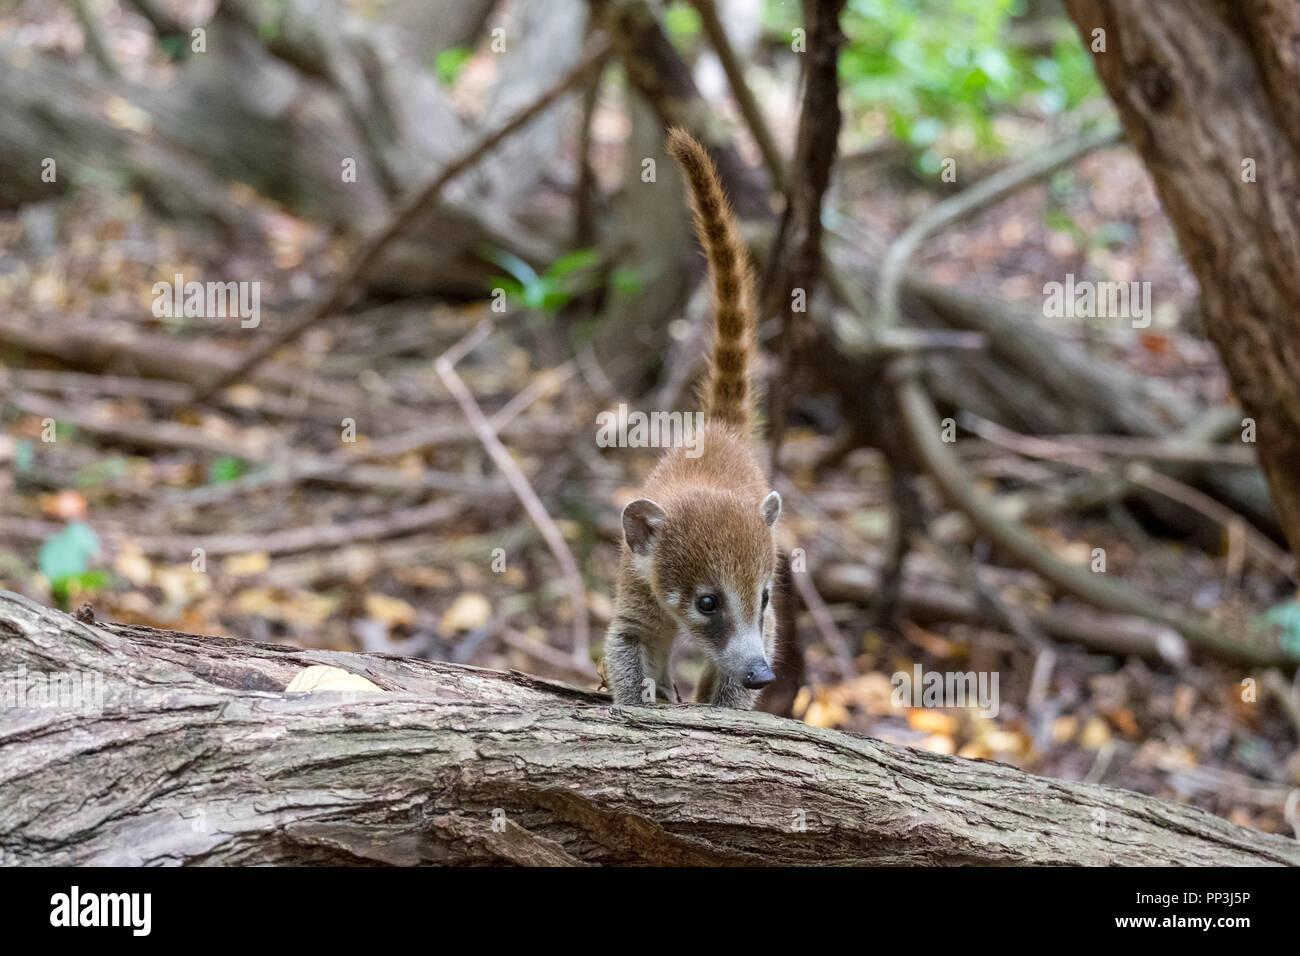 Baby Coati - Stock Image